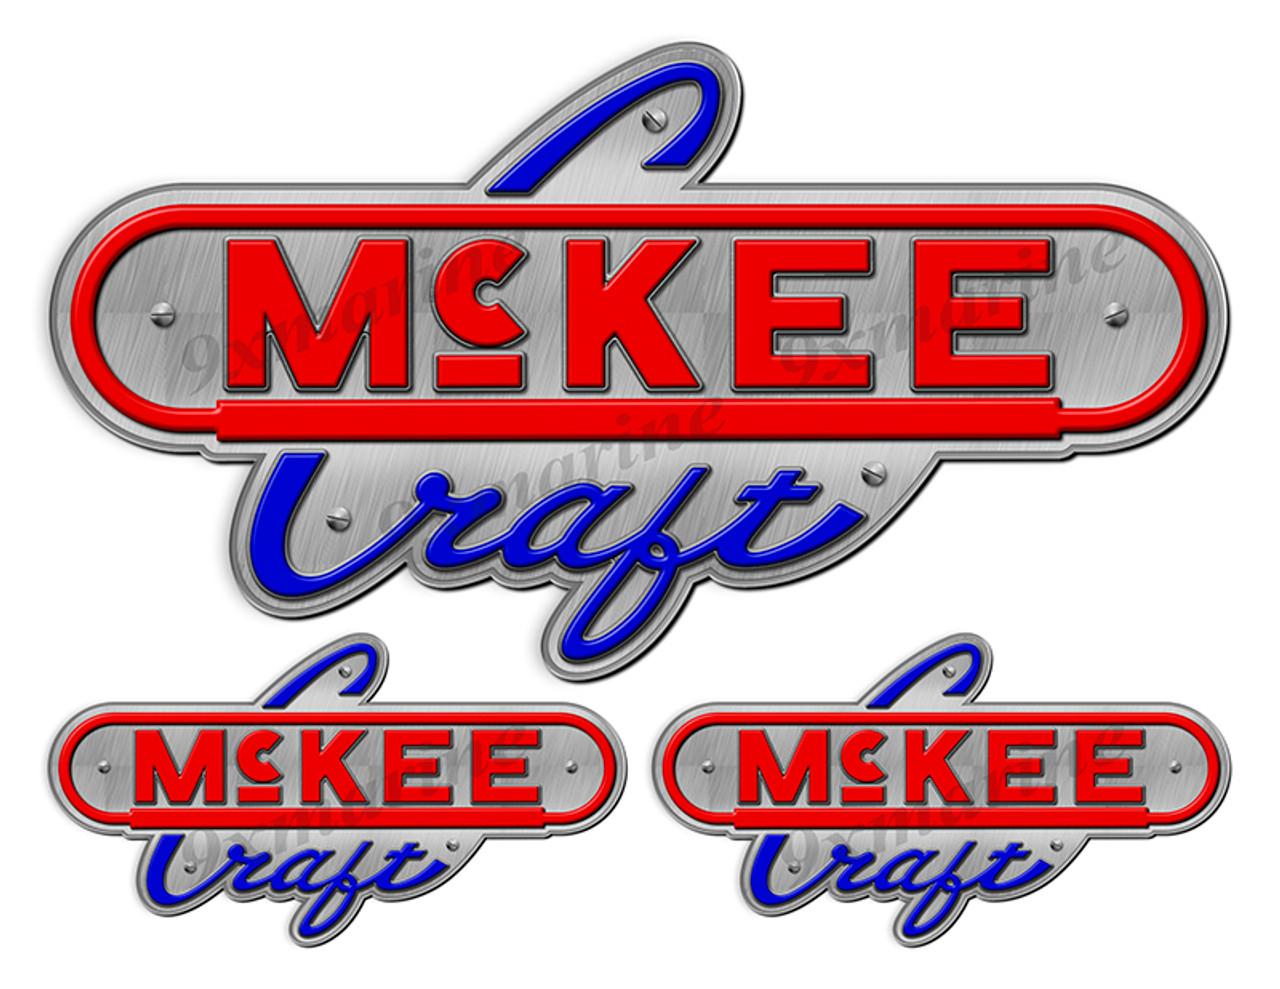 "McKee Craft Vintage Stickers ""3D Vinyl Replica"" of originals - 10"" long"